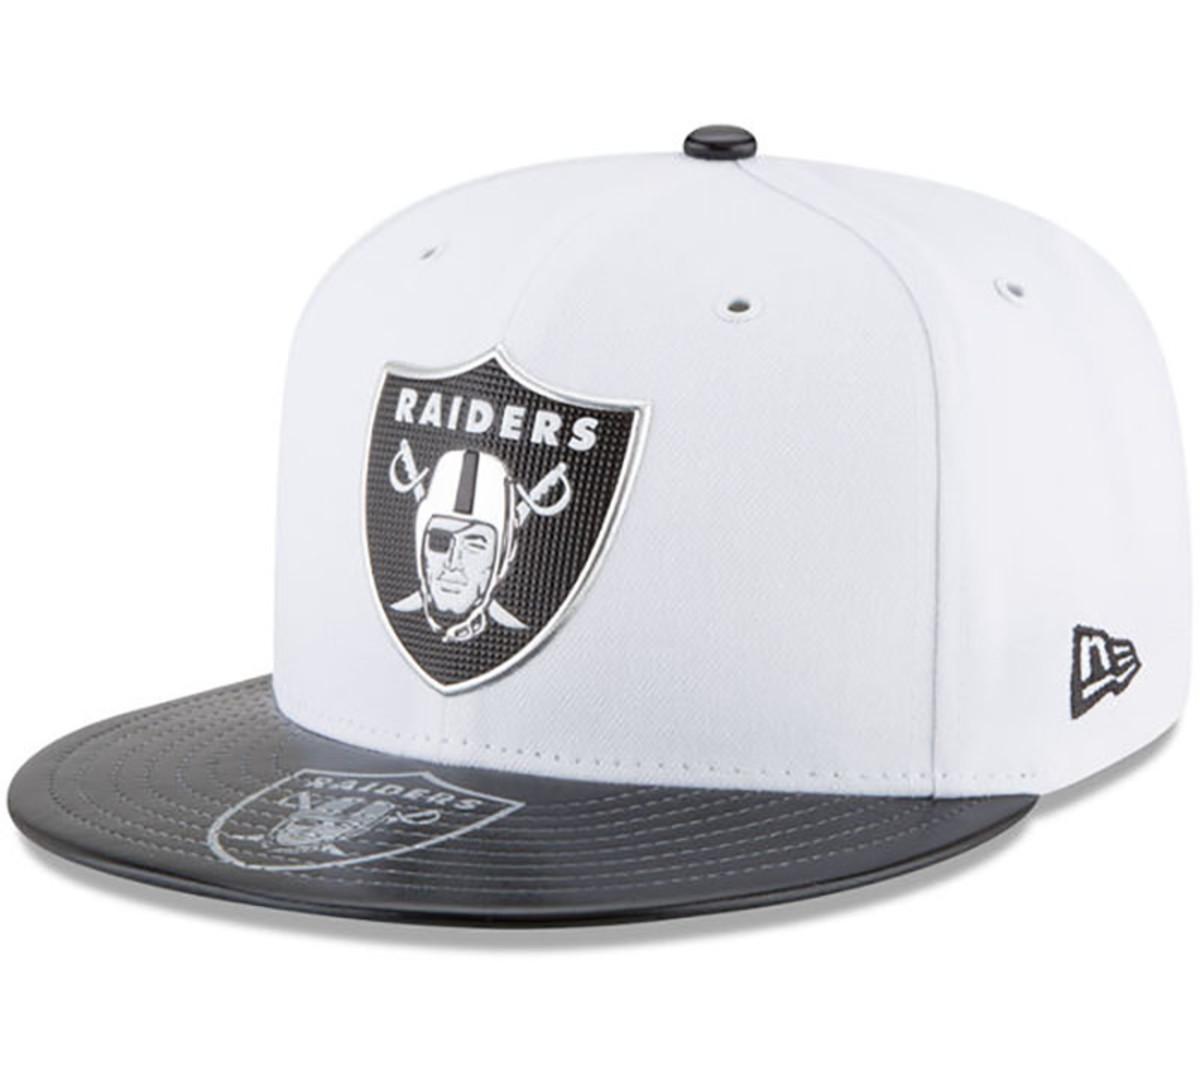 raiders-draft-hat-ranking.jpg